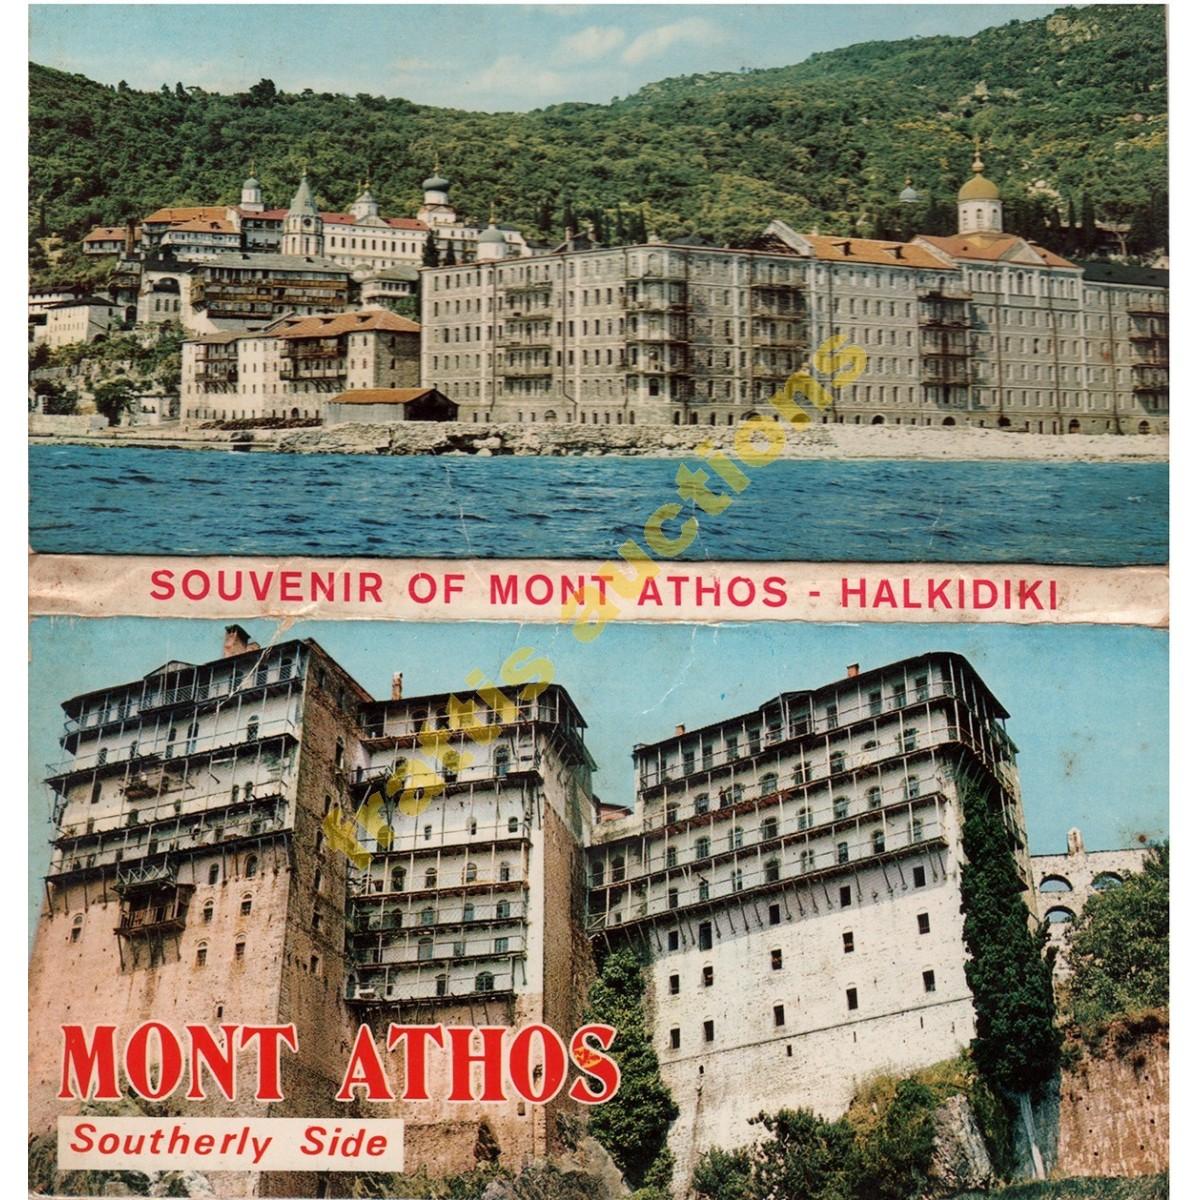 Souvenir of mont Athos, Halkidiki. Εκδοσις Γρηγορούδη, Θεσσαλονικη